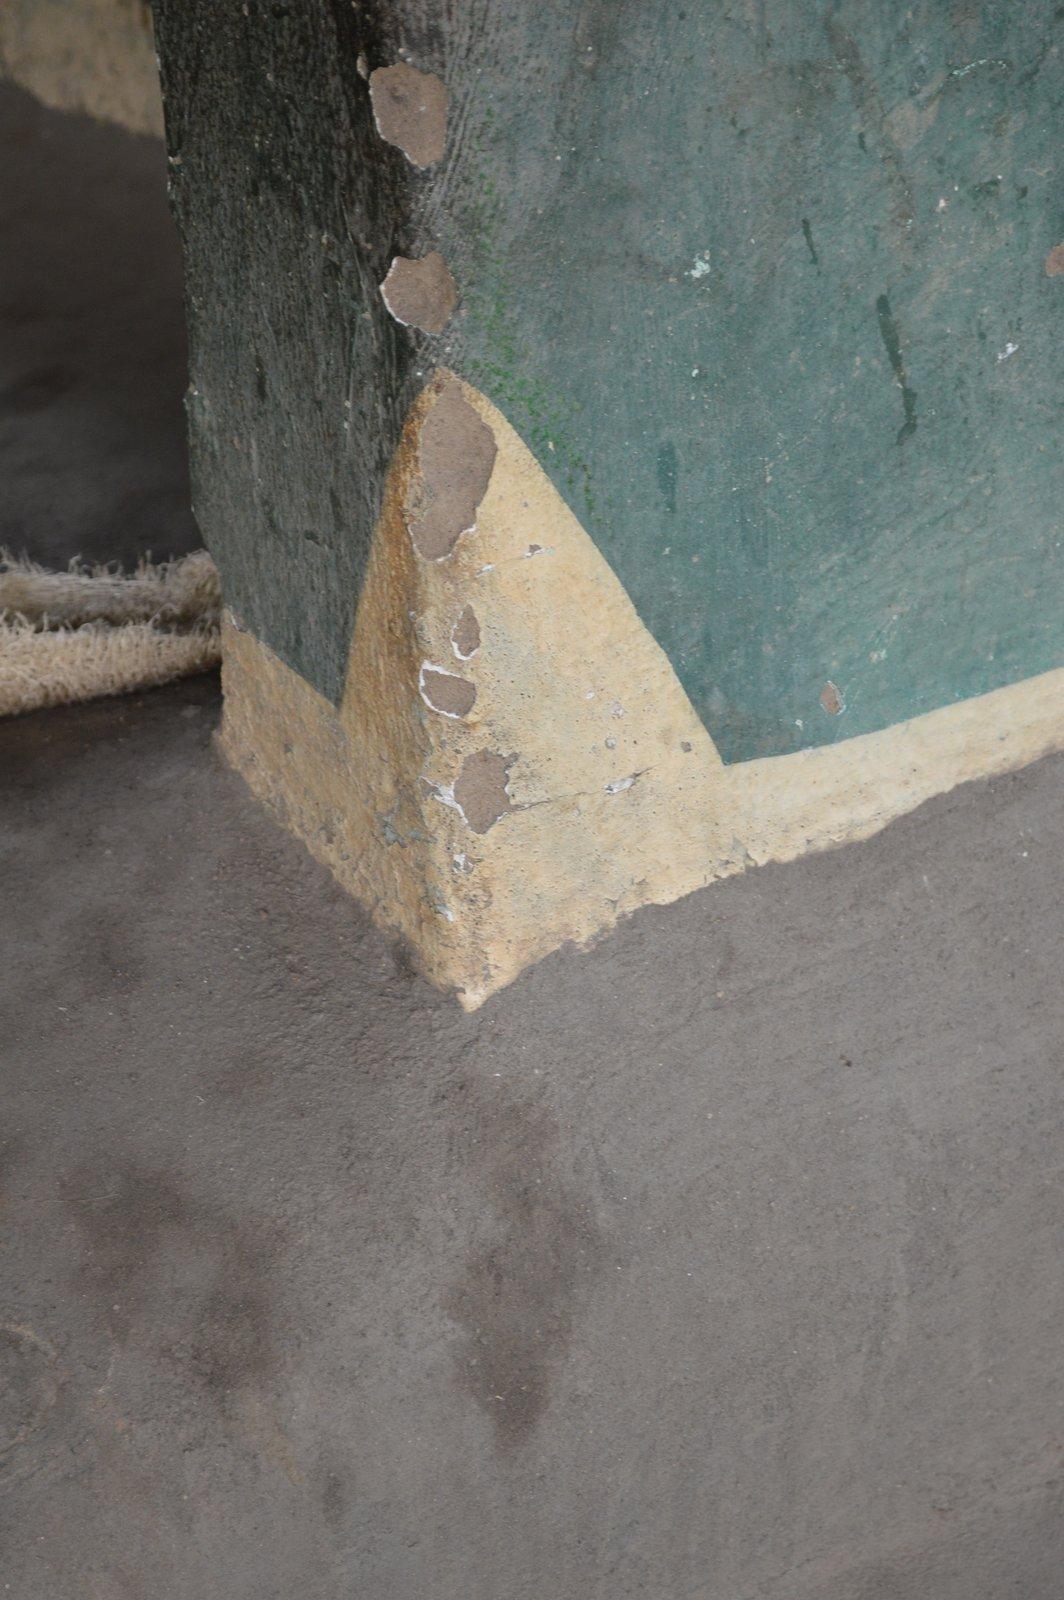 Chikasima, Nkhata Bay (7).JPG